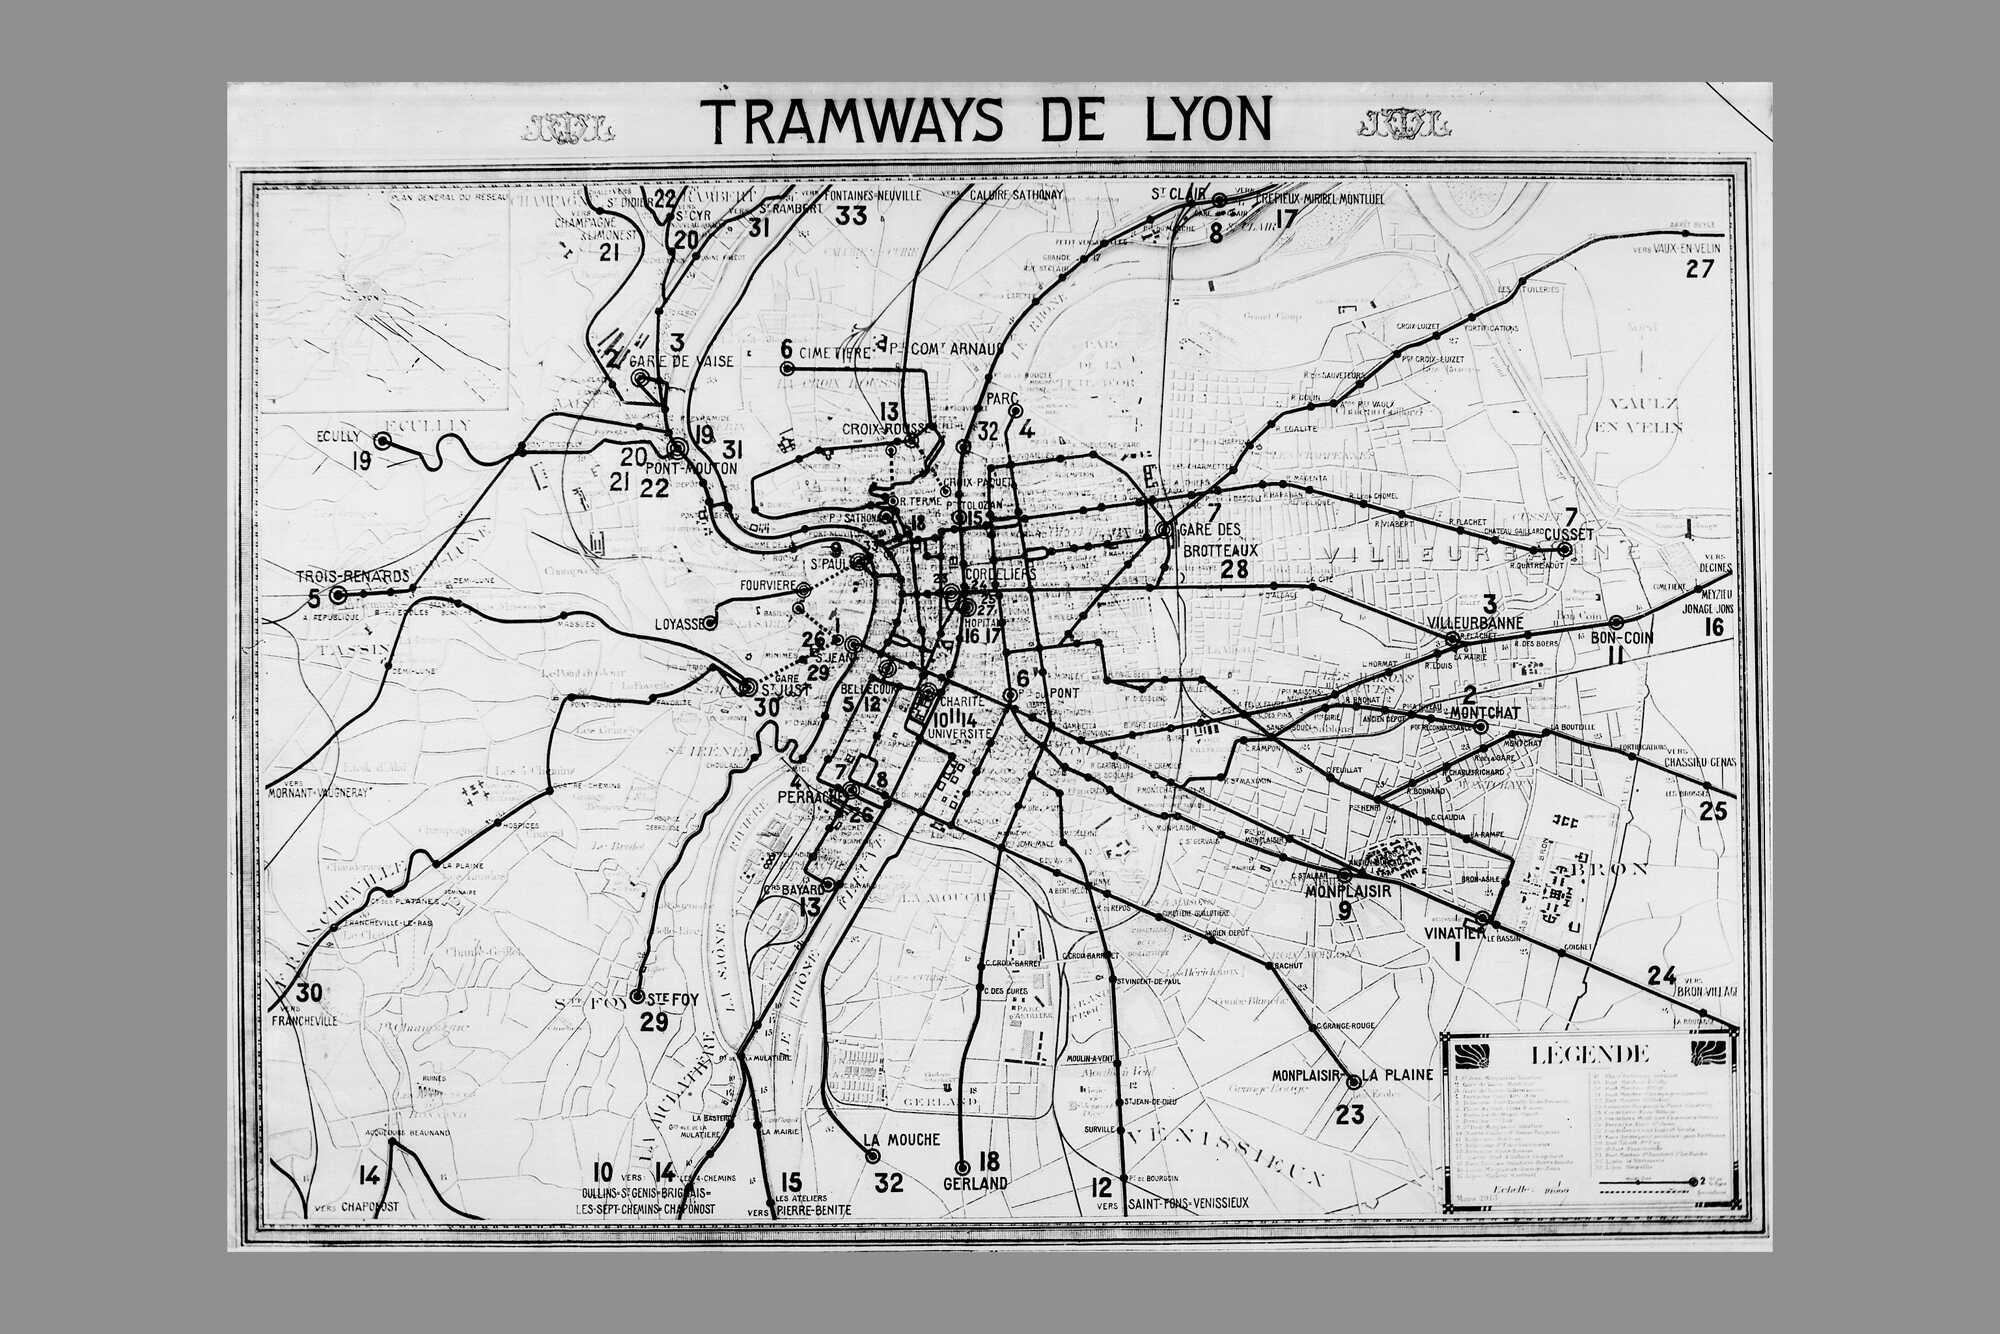 Reseau de tramway à Lyon en 1894